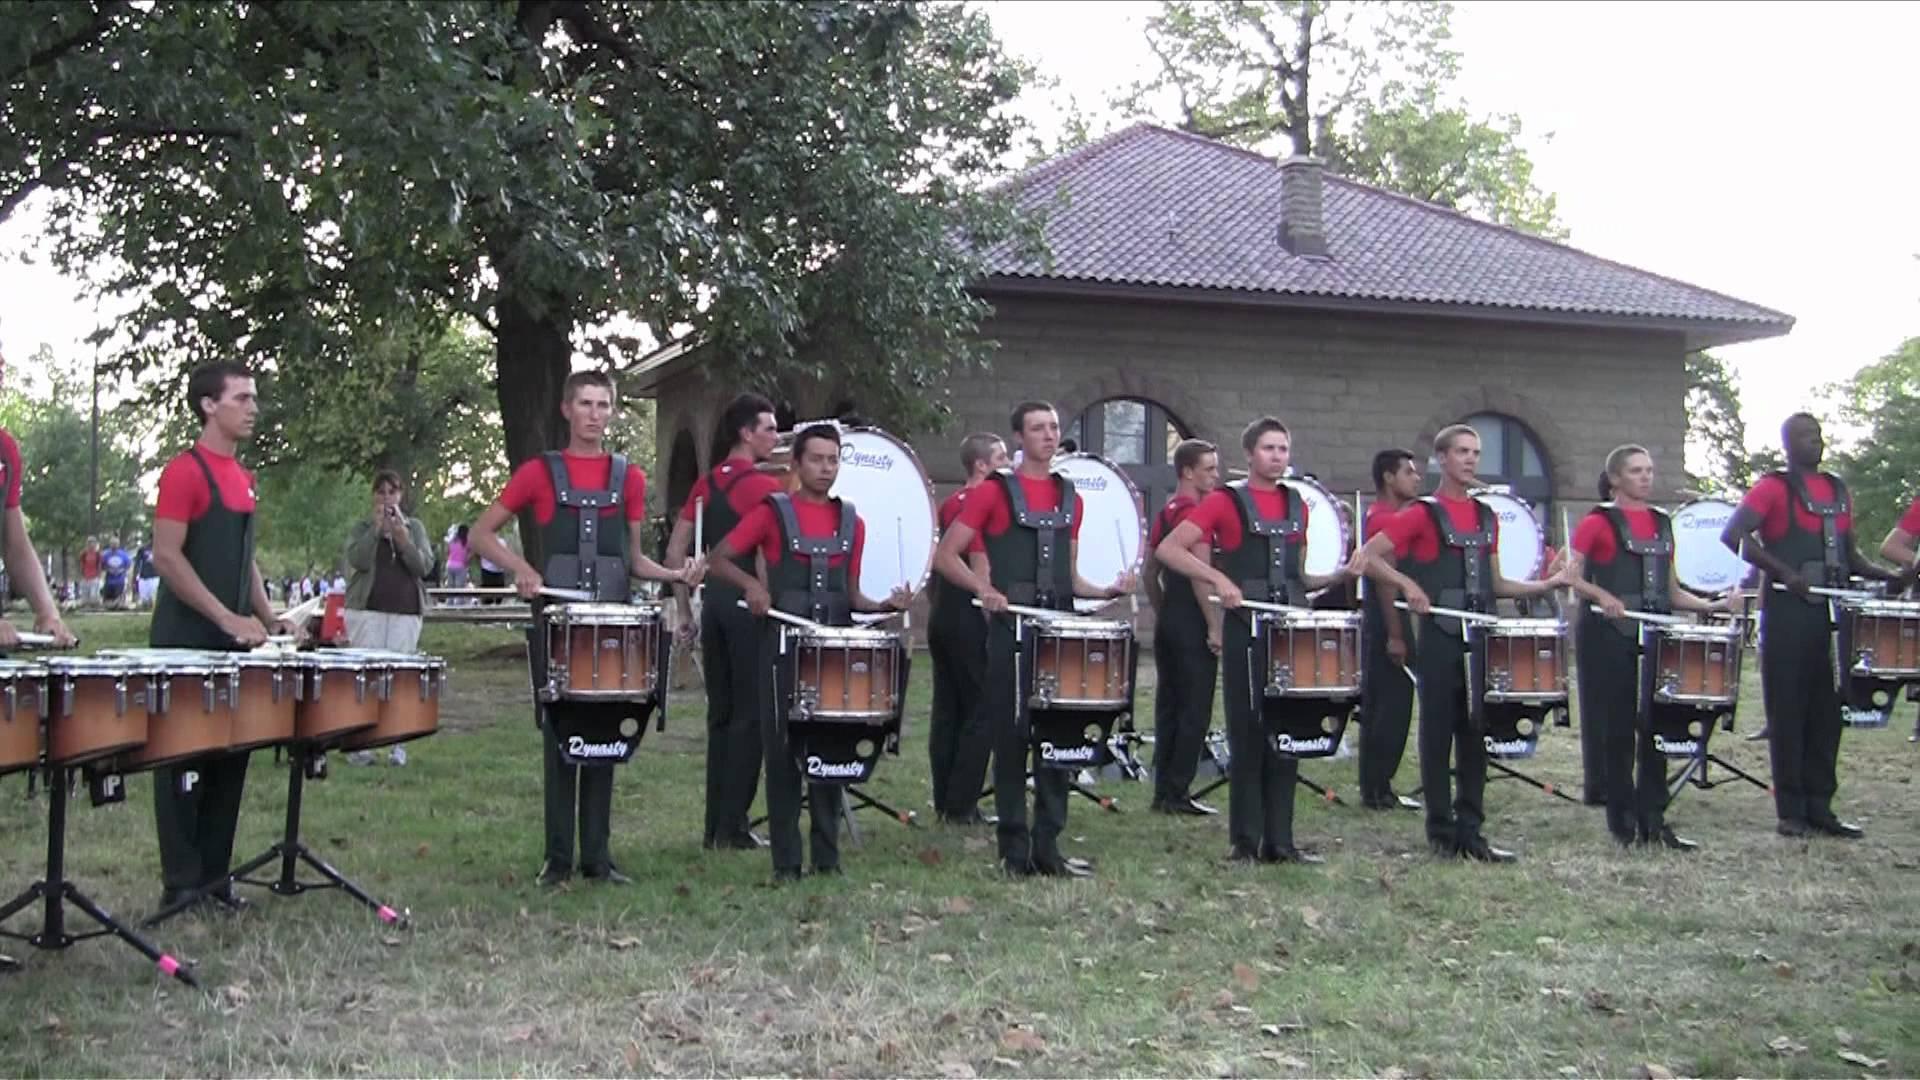 Vanguard Drumline 2012 – Feature